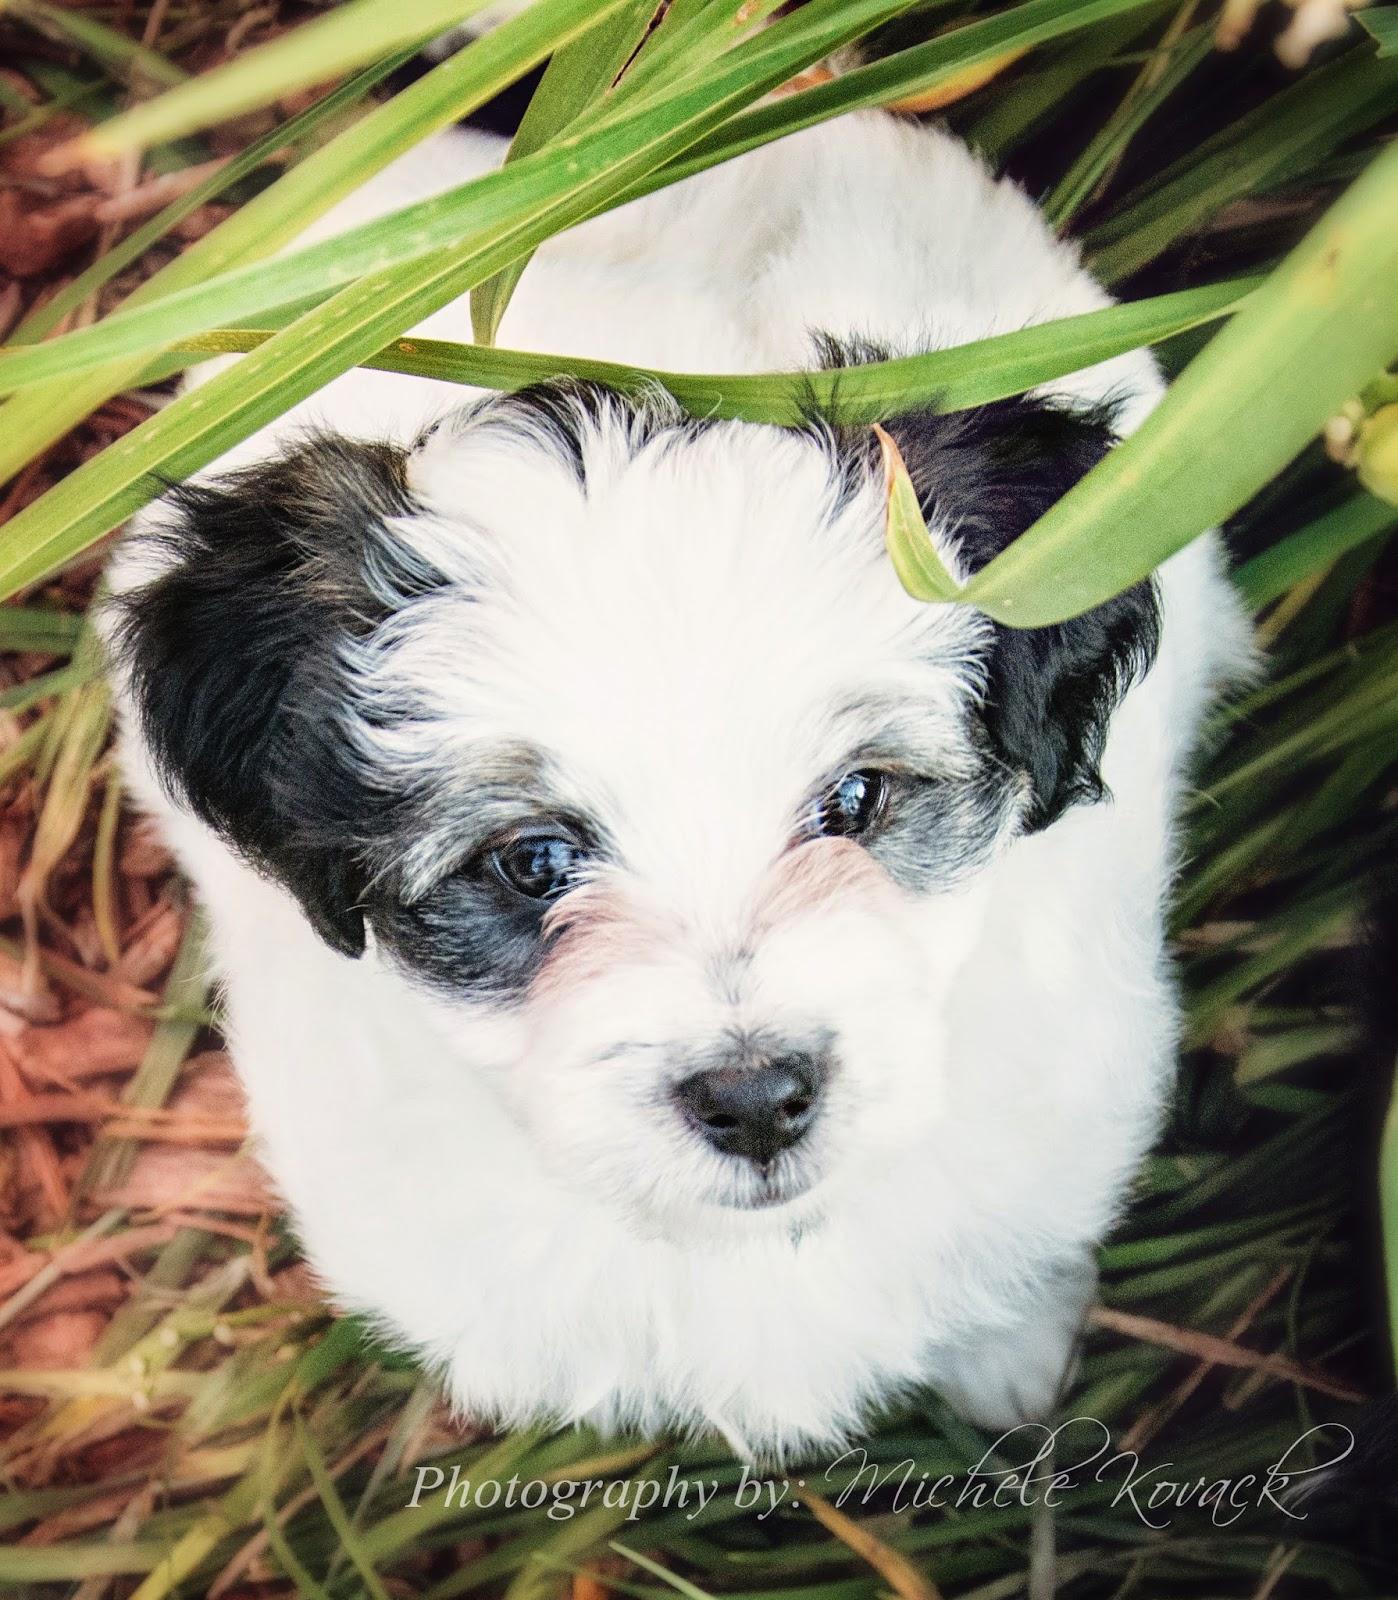 http://4.bp.blogspot.com/-_P7Y-UXBCL0/U9ZJNvsyl_I/AAAAAAAARoU/-FKDHlvCnOA/s1600/puppytwo.jpg